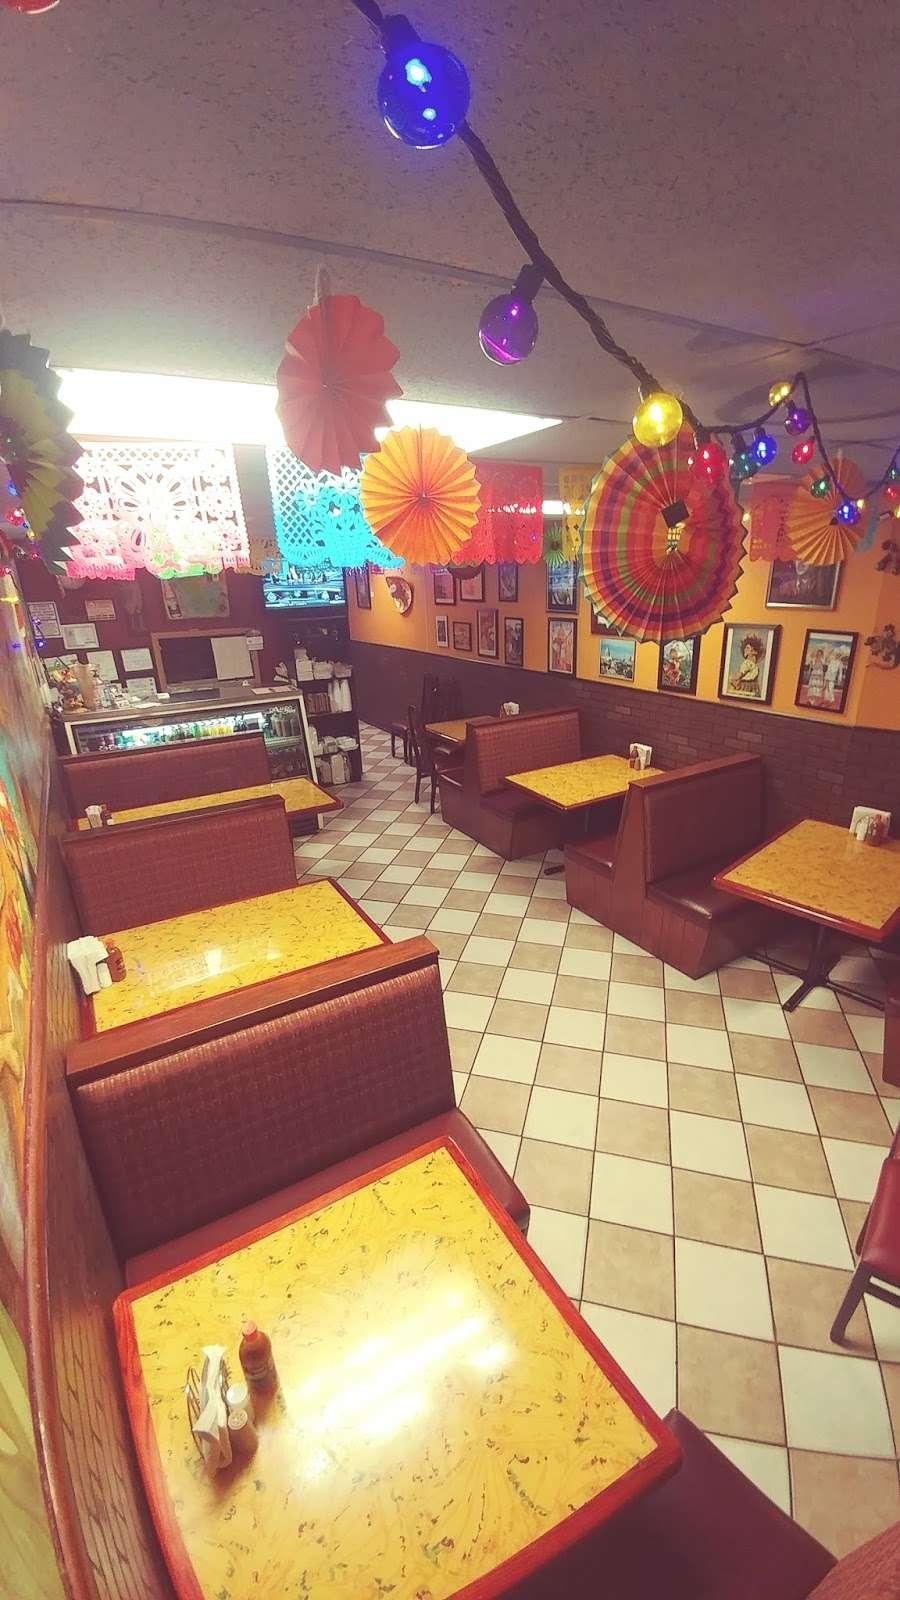 El Pueblo Mexican restaurant - restaurant  | Photo 1 of 10 | Address: 7124 Aloma Ave, Winter Park, FL 32792, USA | Phone: (407) 677-5534